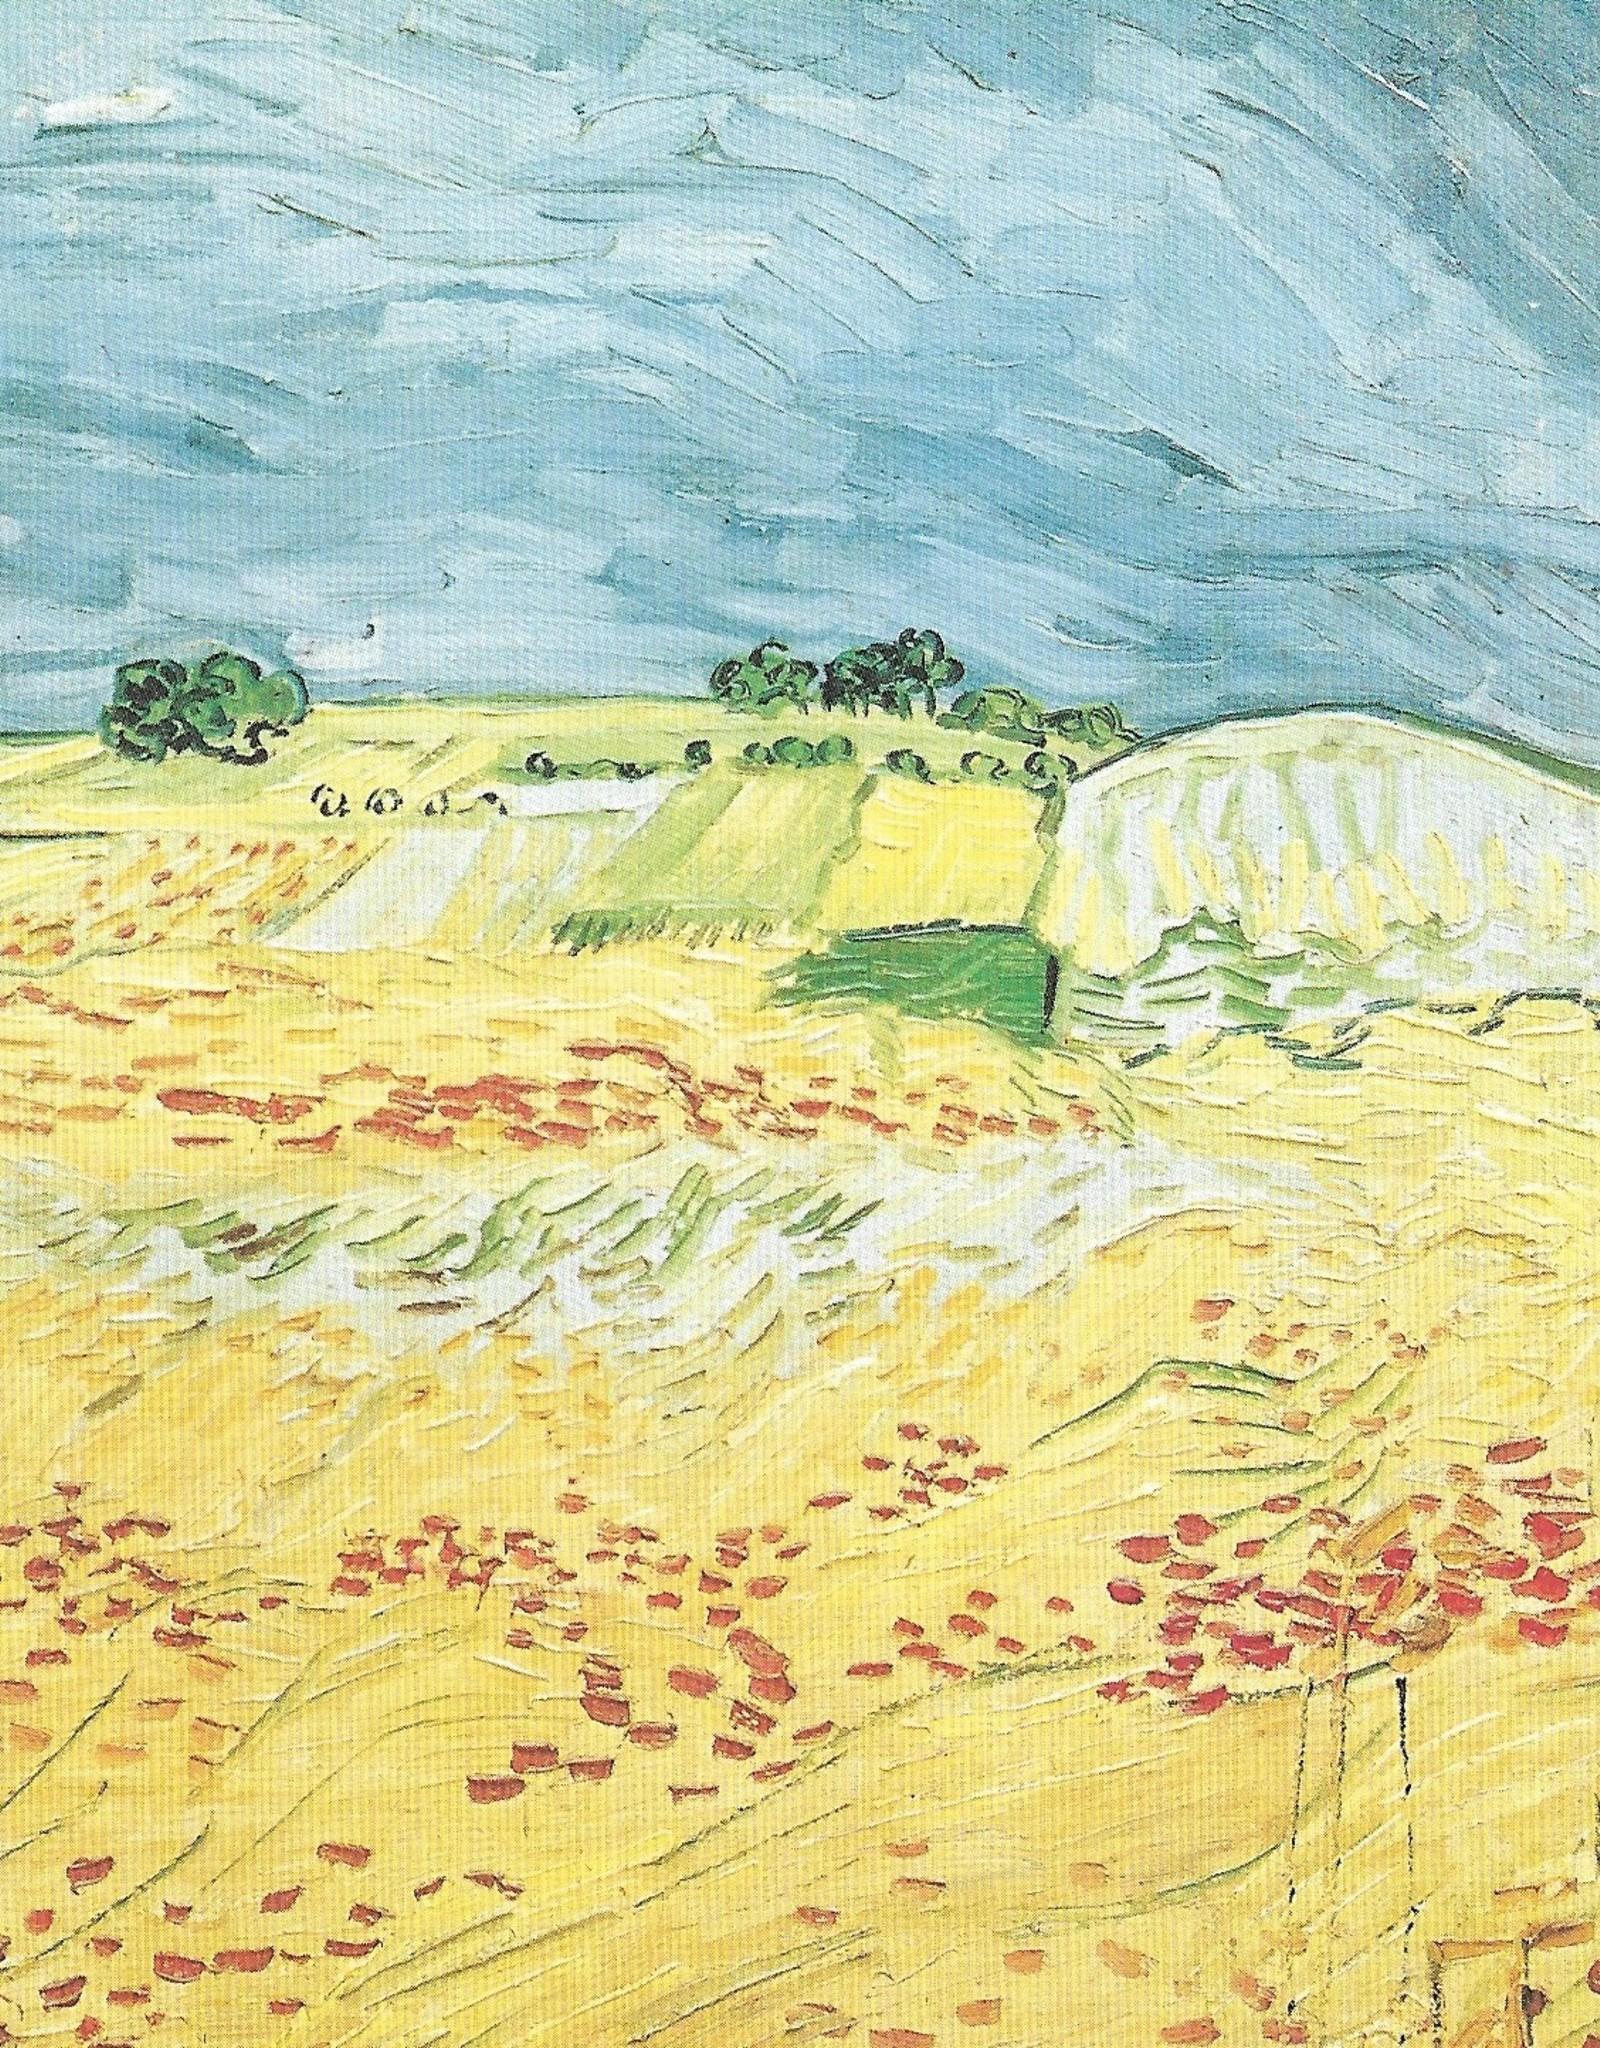 "Galison Art Card, Blank Card 5"" x 6.75"", Van Gogh, The Plain at Auvers"